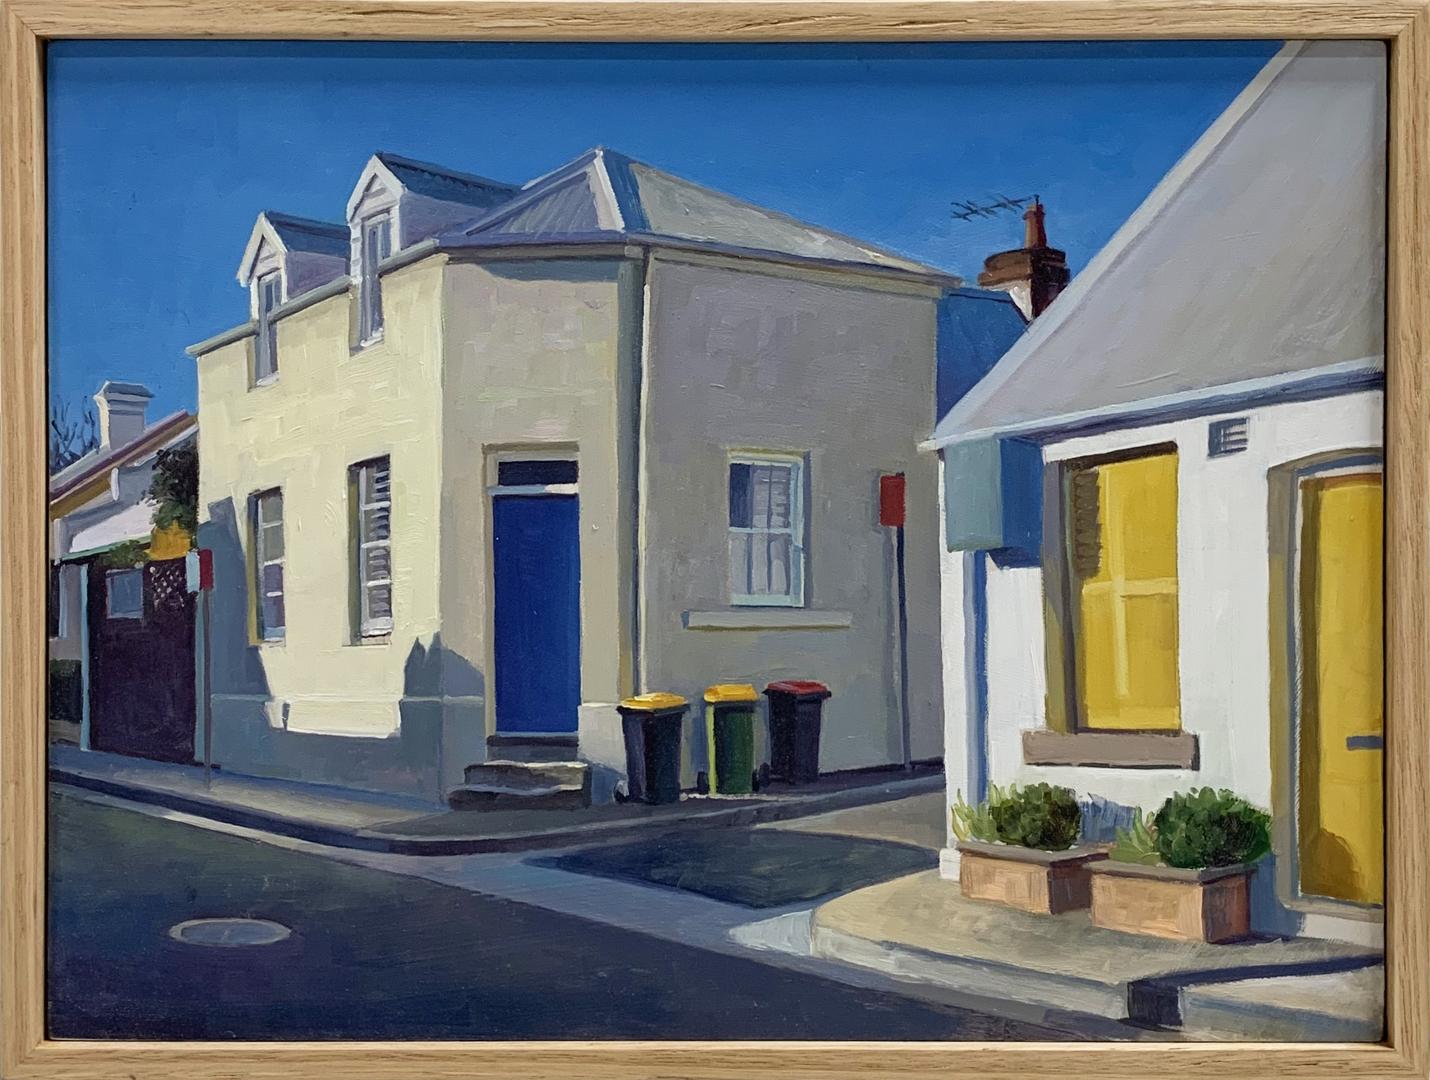 Blue door yellow window - Prospect St, Paddington image